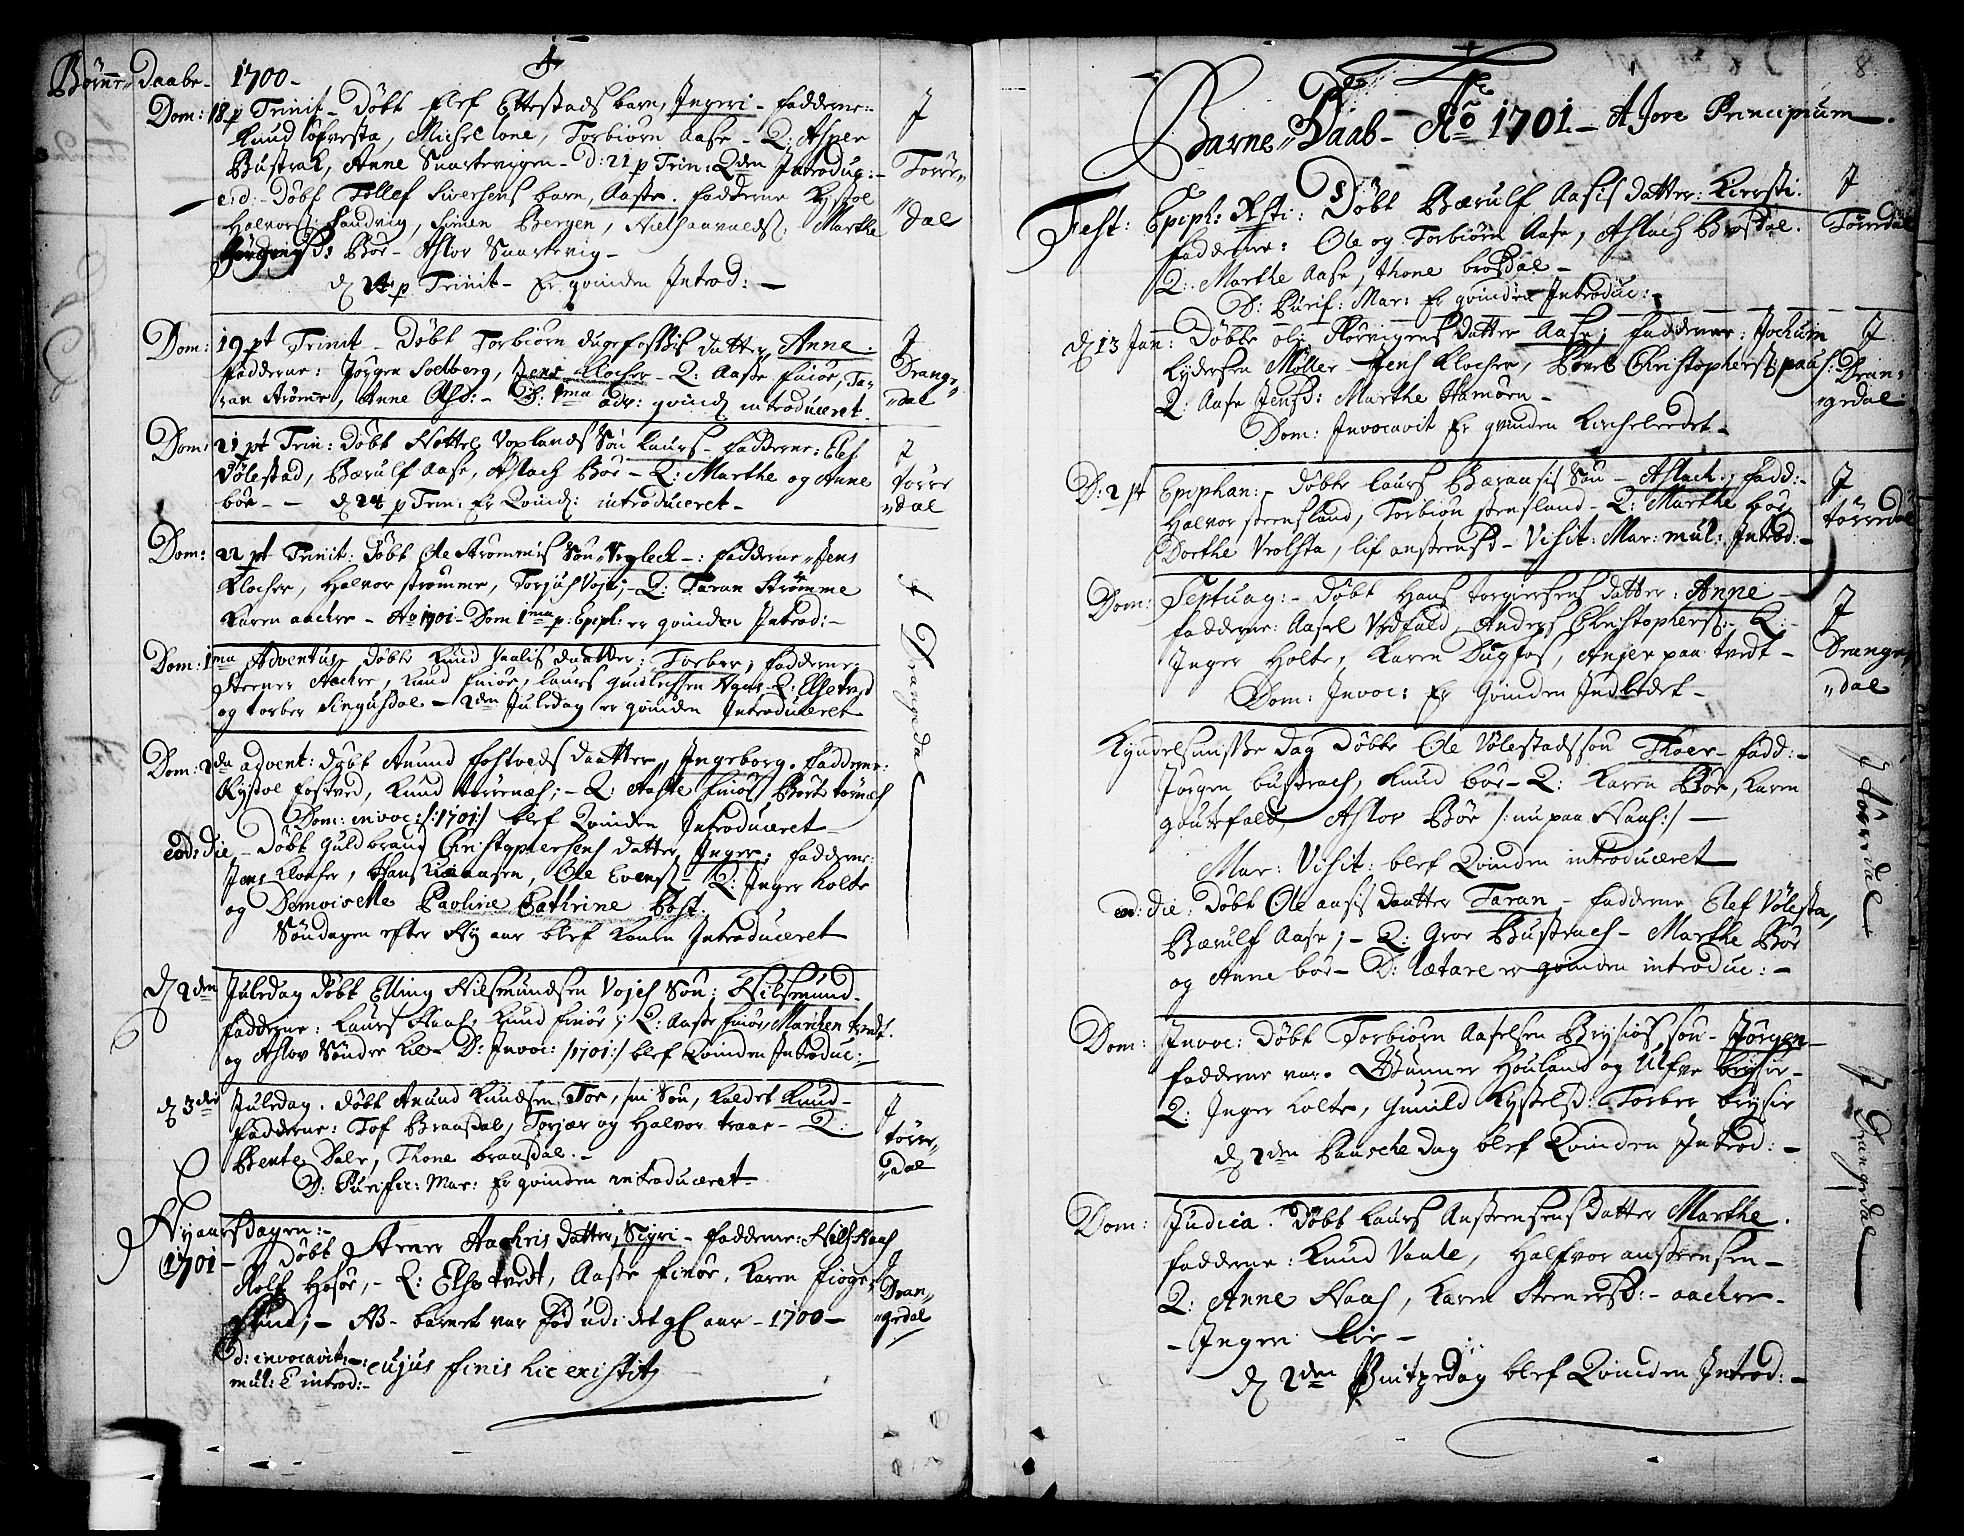 SAKO, Drangedal kirkebøker, F/Fa/L0001: Ministerialbok nr. 1, 1697-1767, s. 8